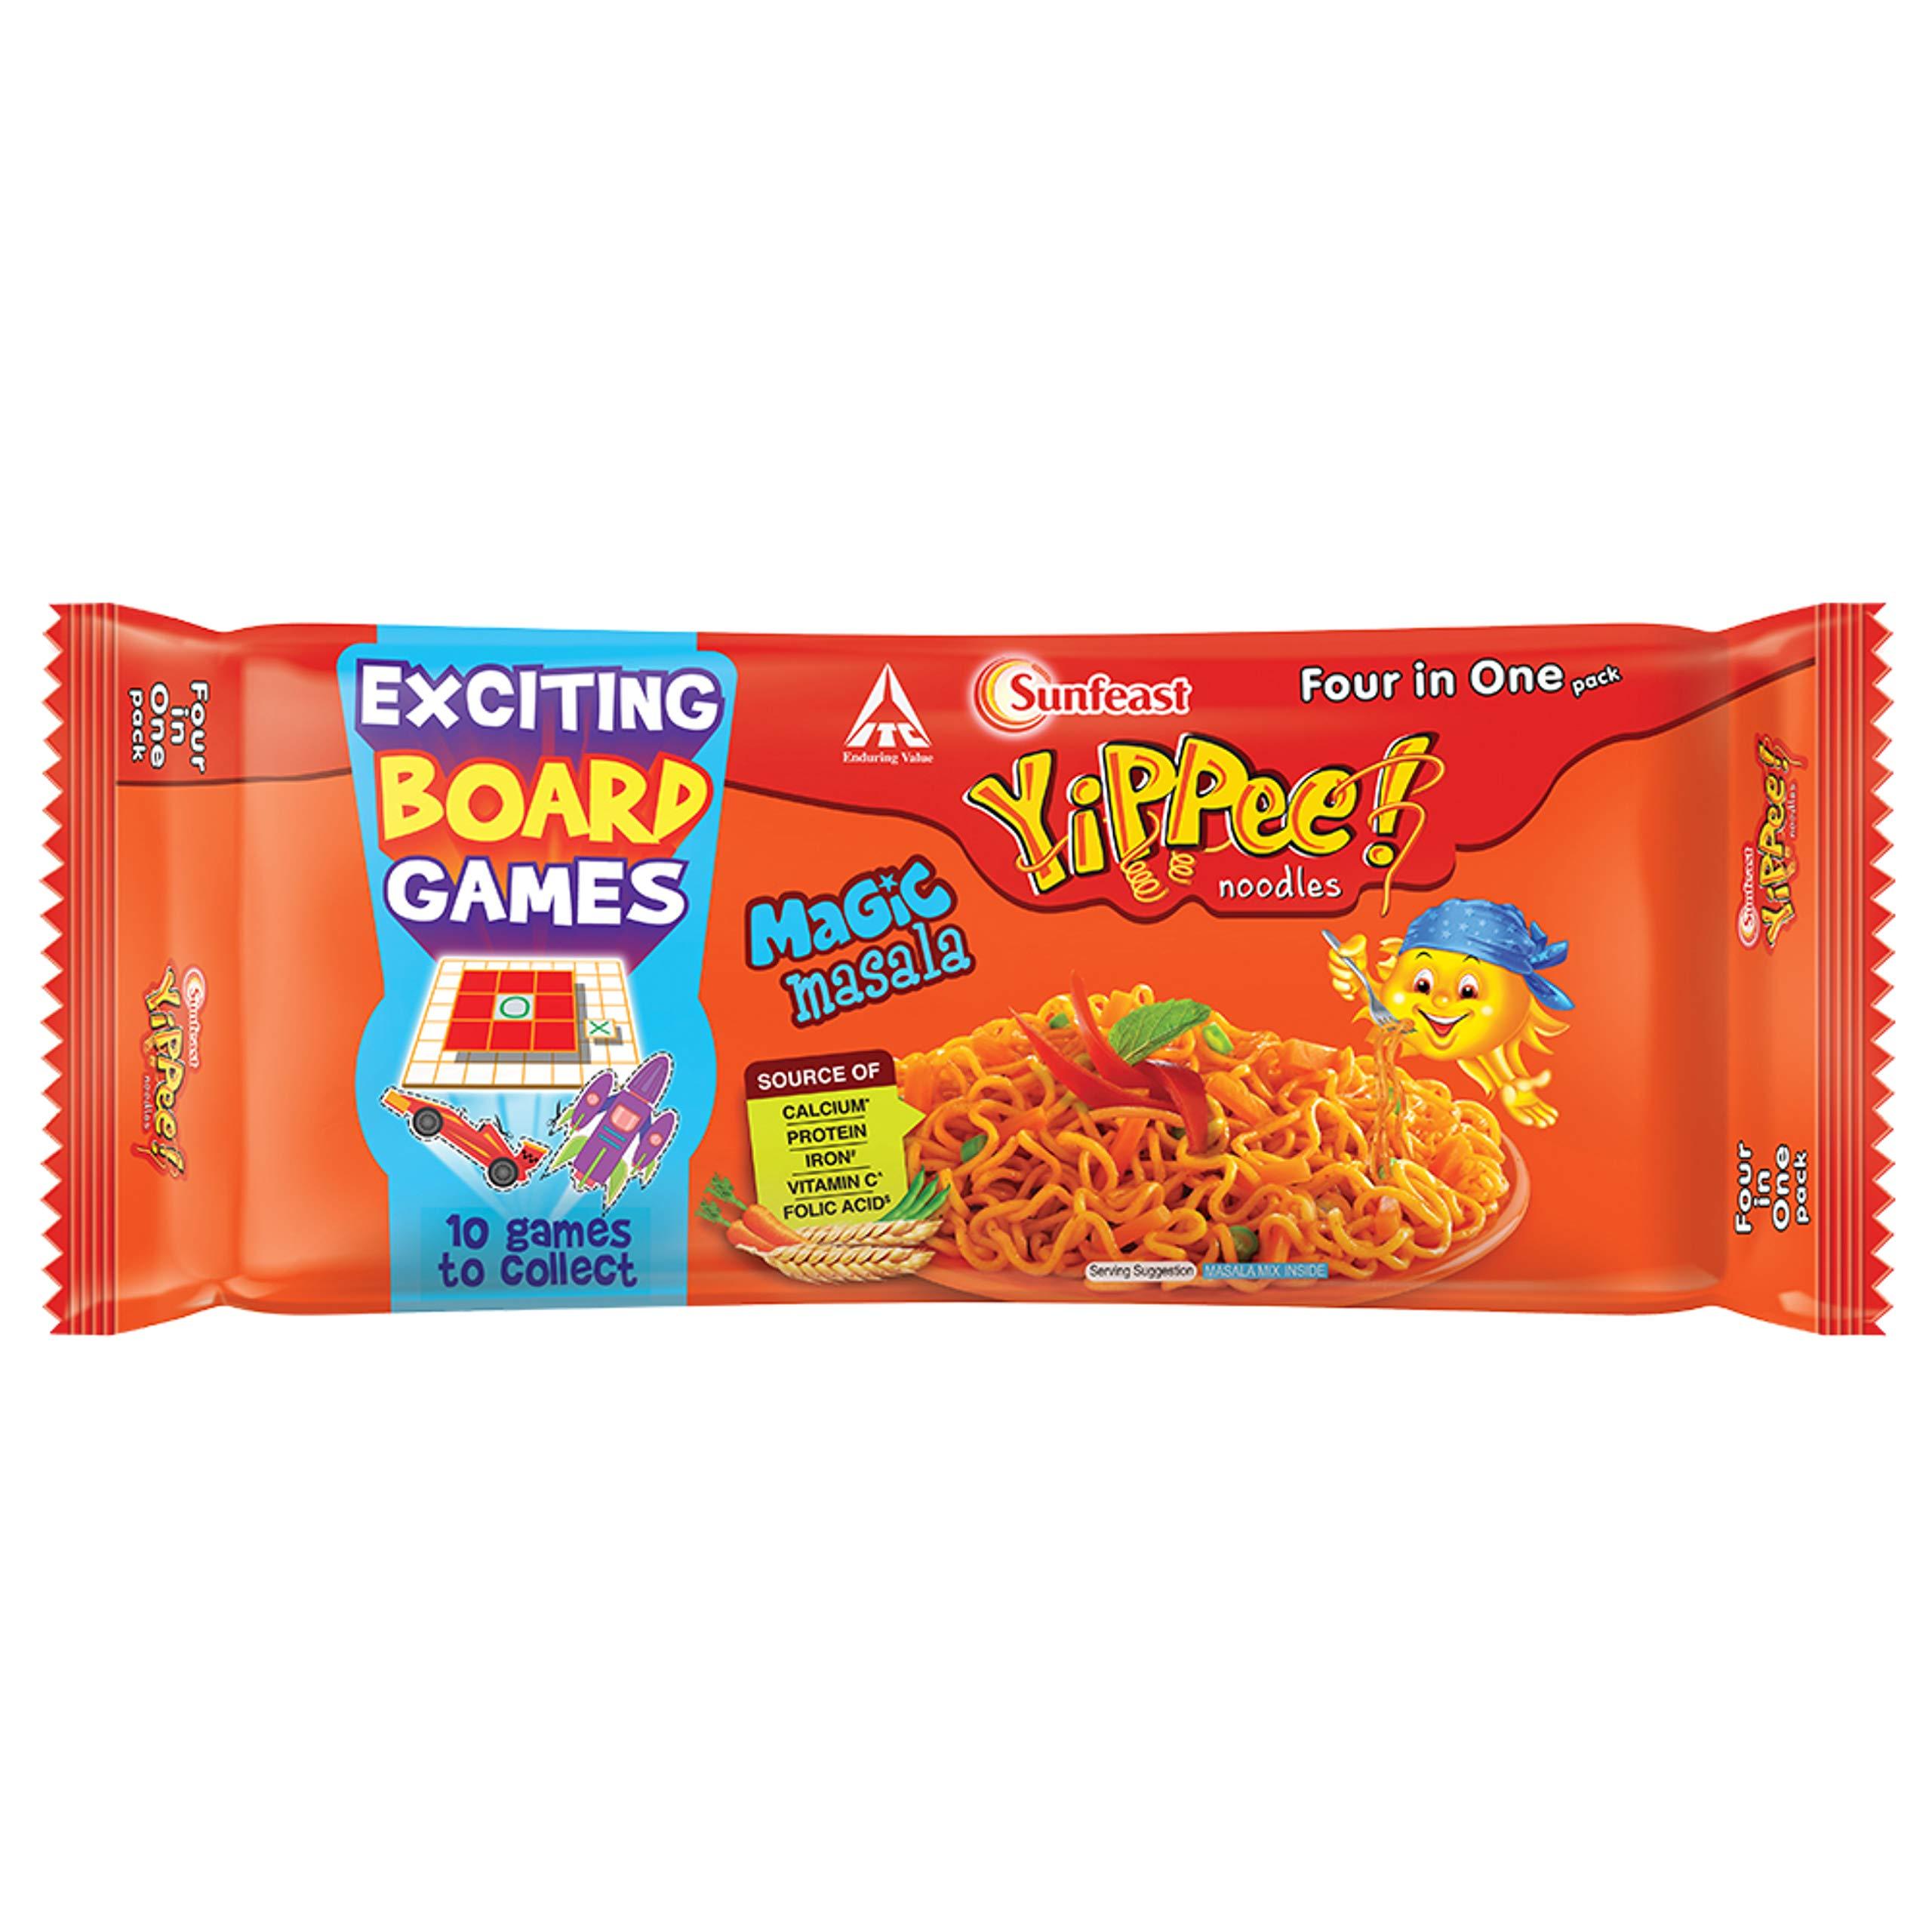 Sunfeast Yippee Noodles - Magic Masala, 240g Pack